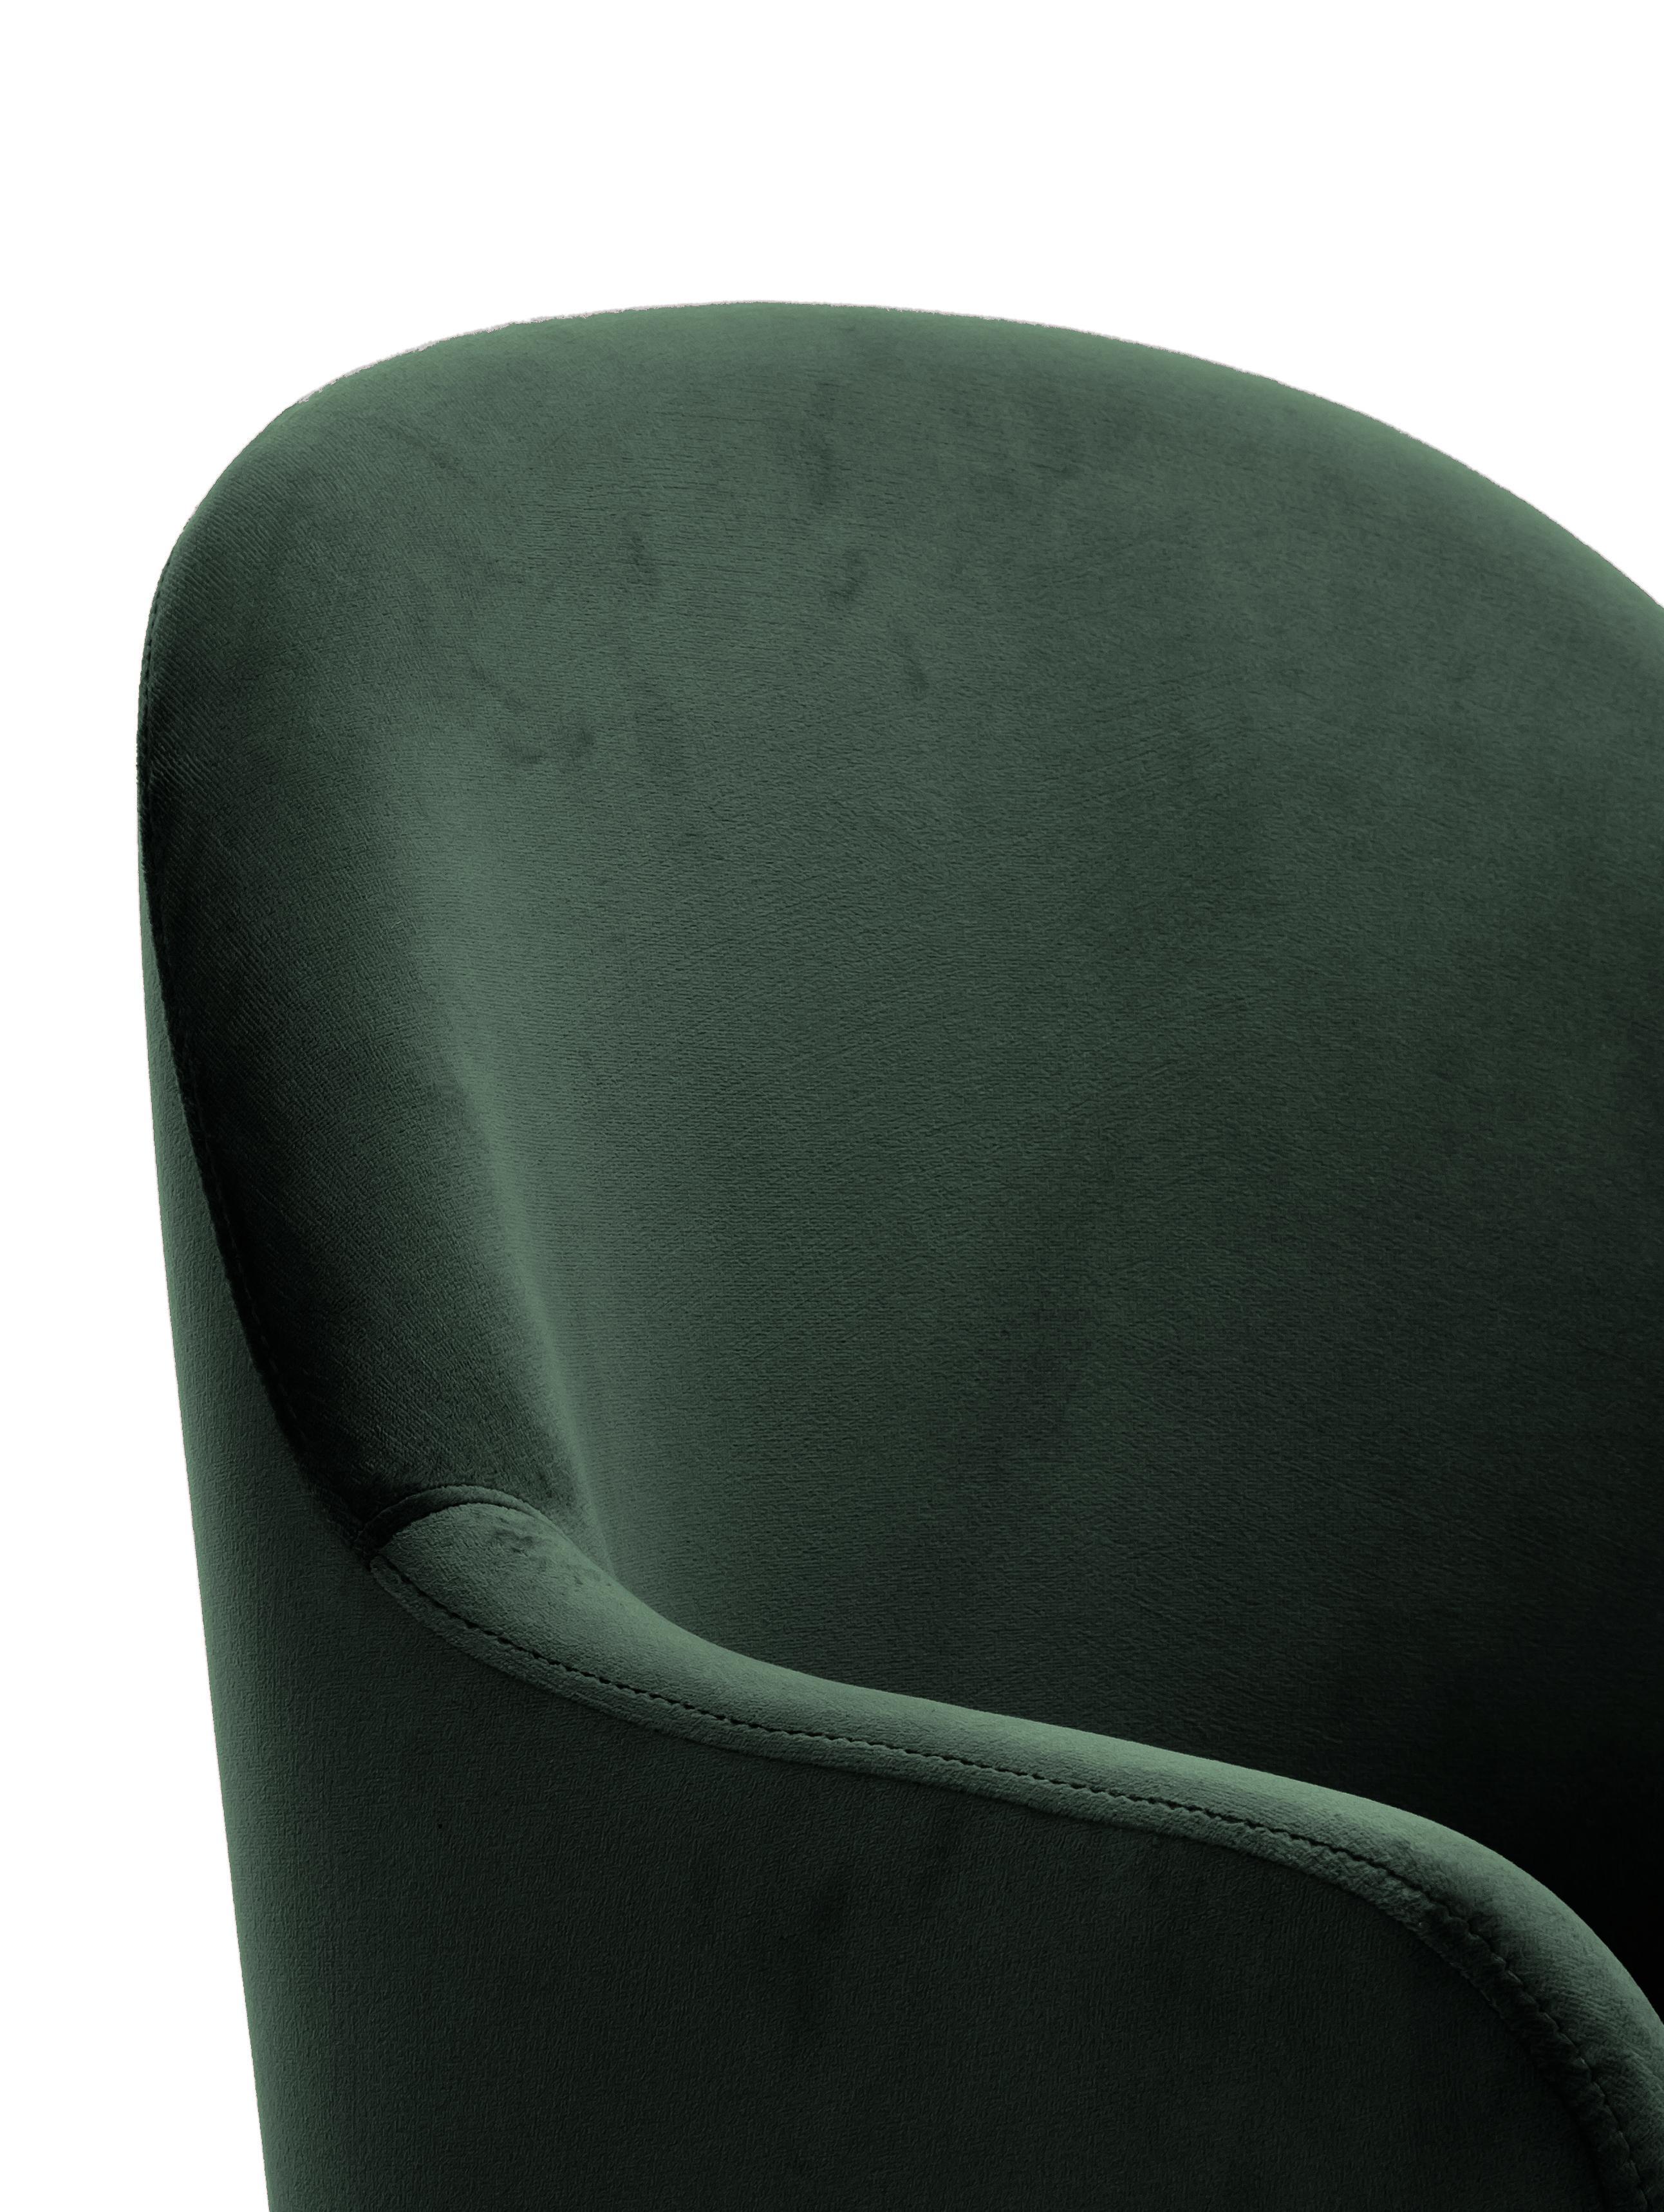 Samt-Armlehnstuhl Rachel, Bezug: Samt (Polyester) 50.000 S, Beine: Metall, pulverbeschichtet, Samt Dunkelgrün, B 47 x T 64 cm